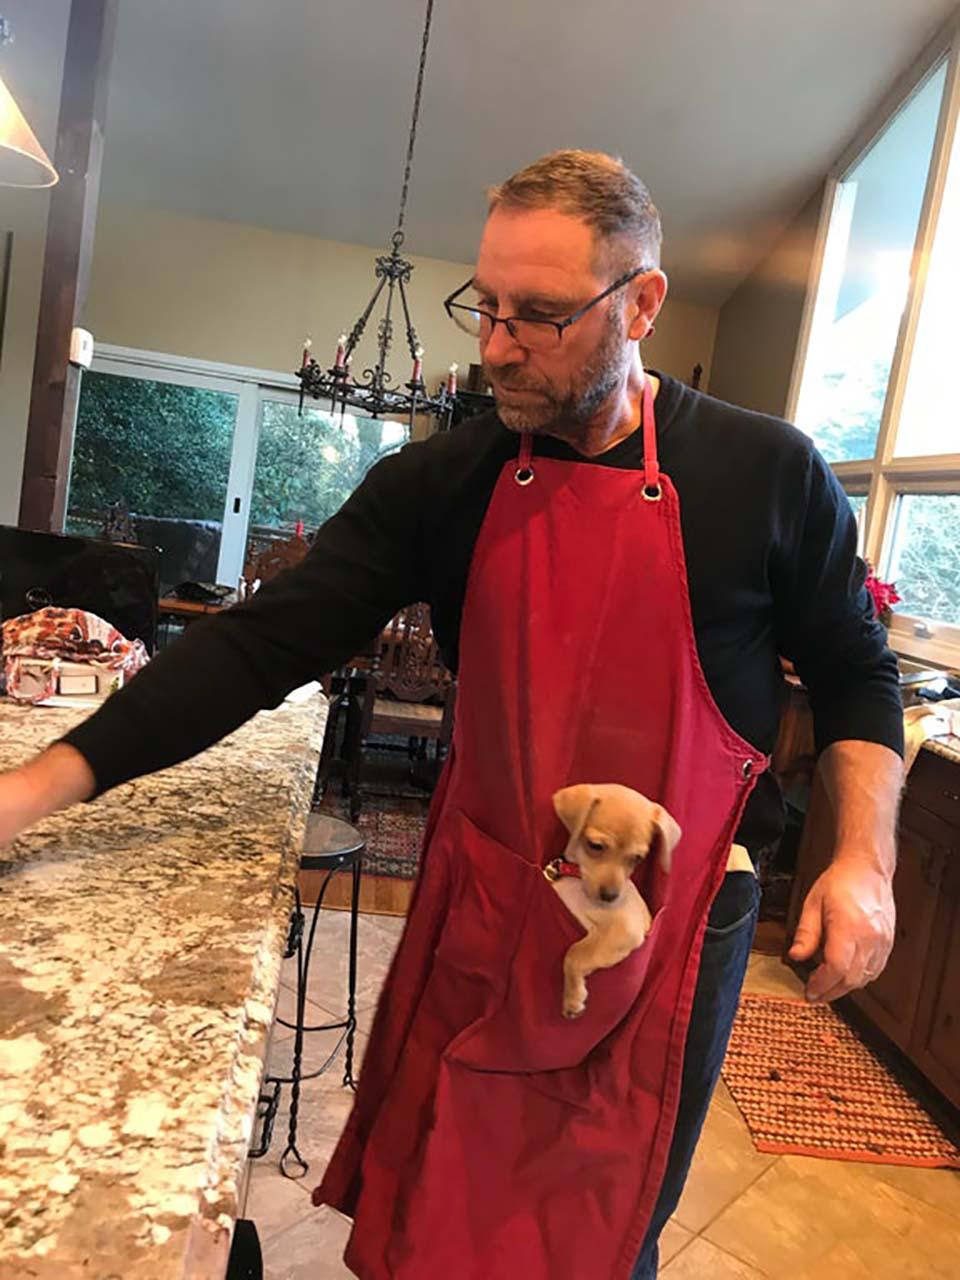 Papá y su mascota